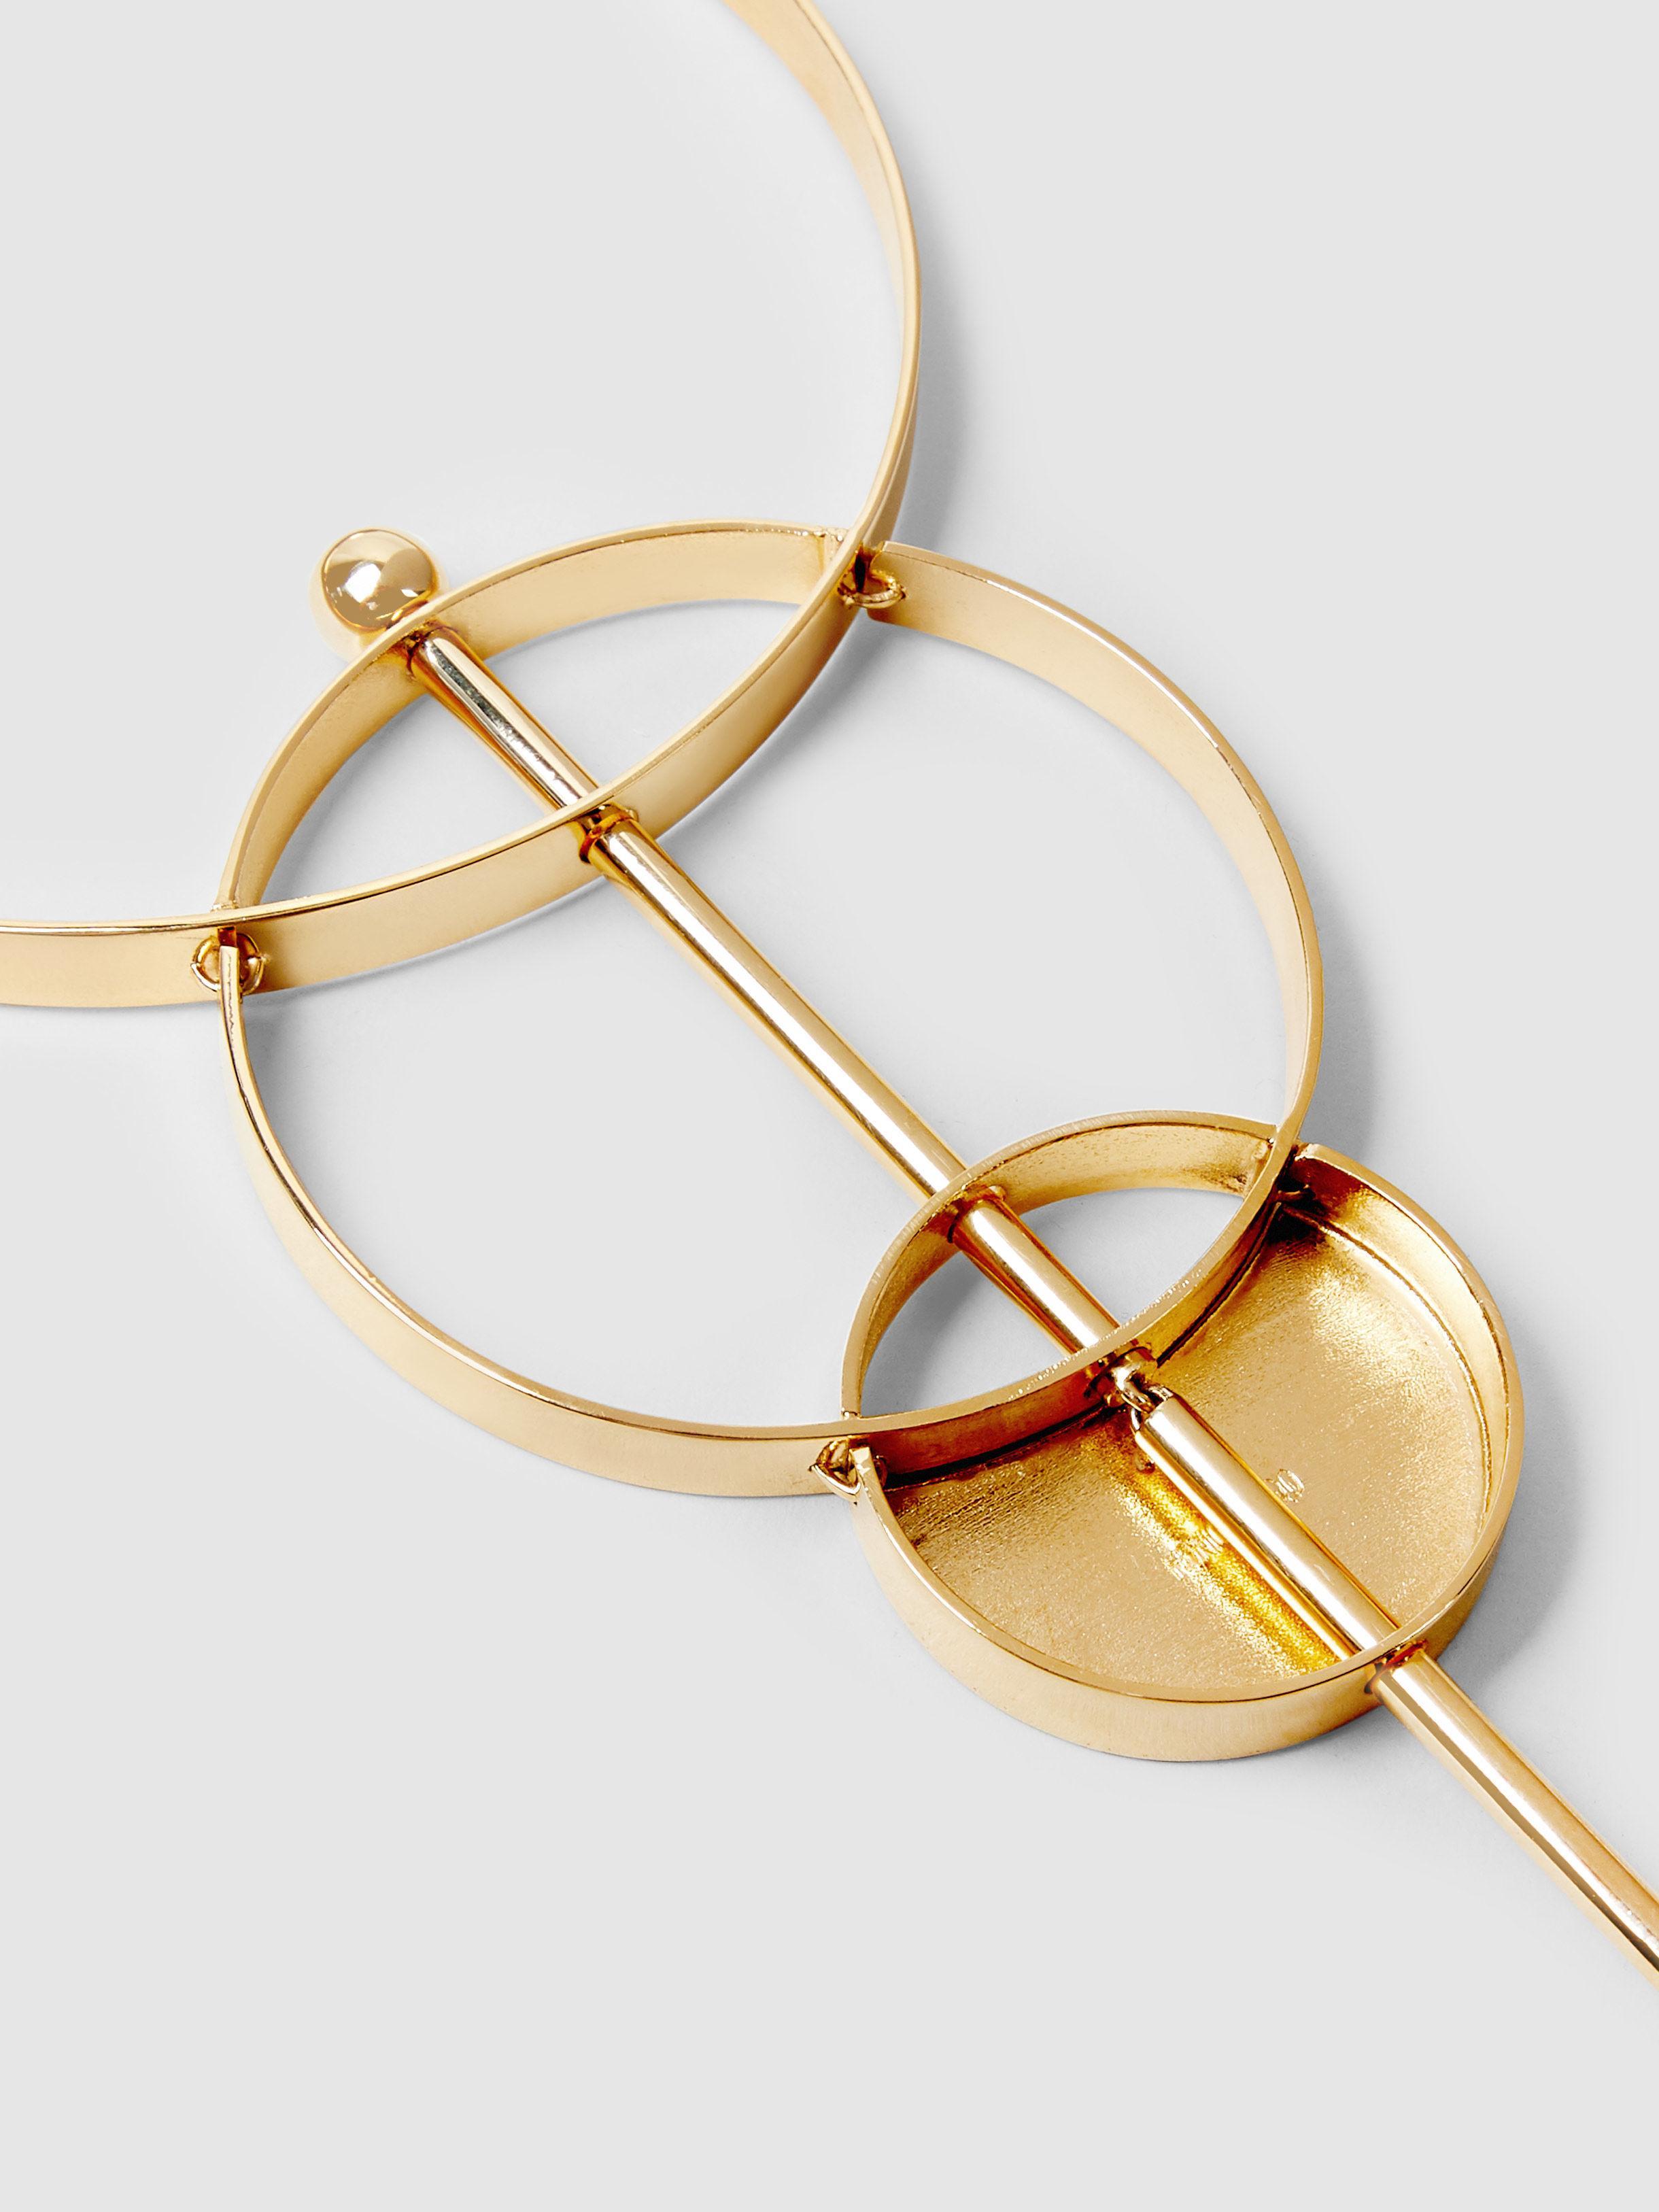 Monica Sordo Silencio Gold And Silver-Tone Necklace RG6F7jY